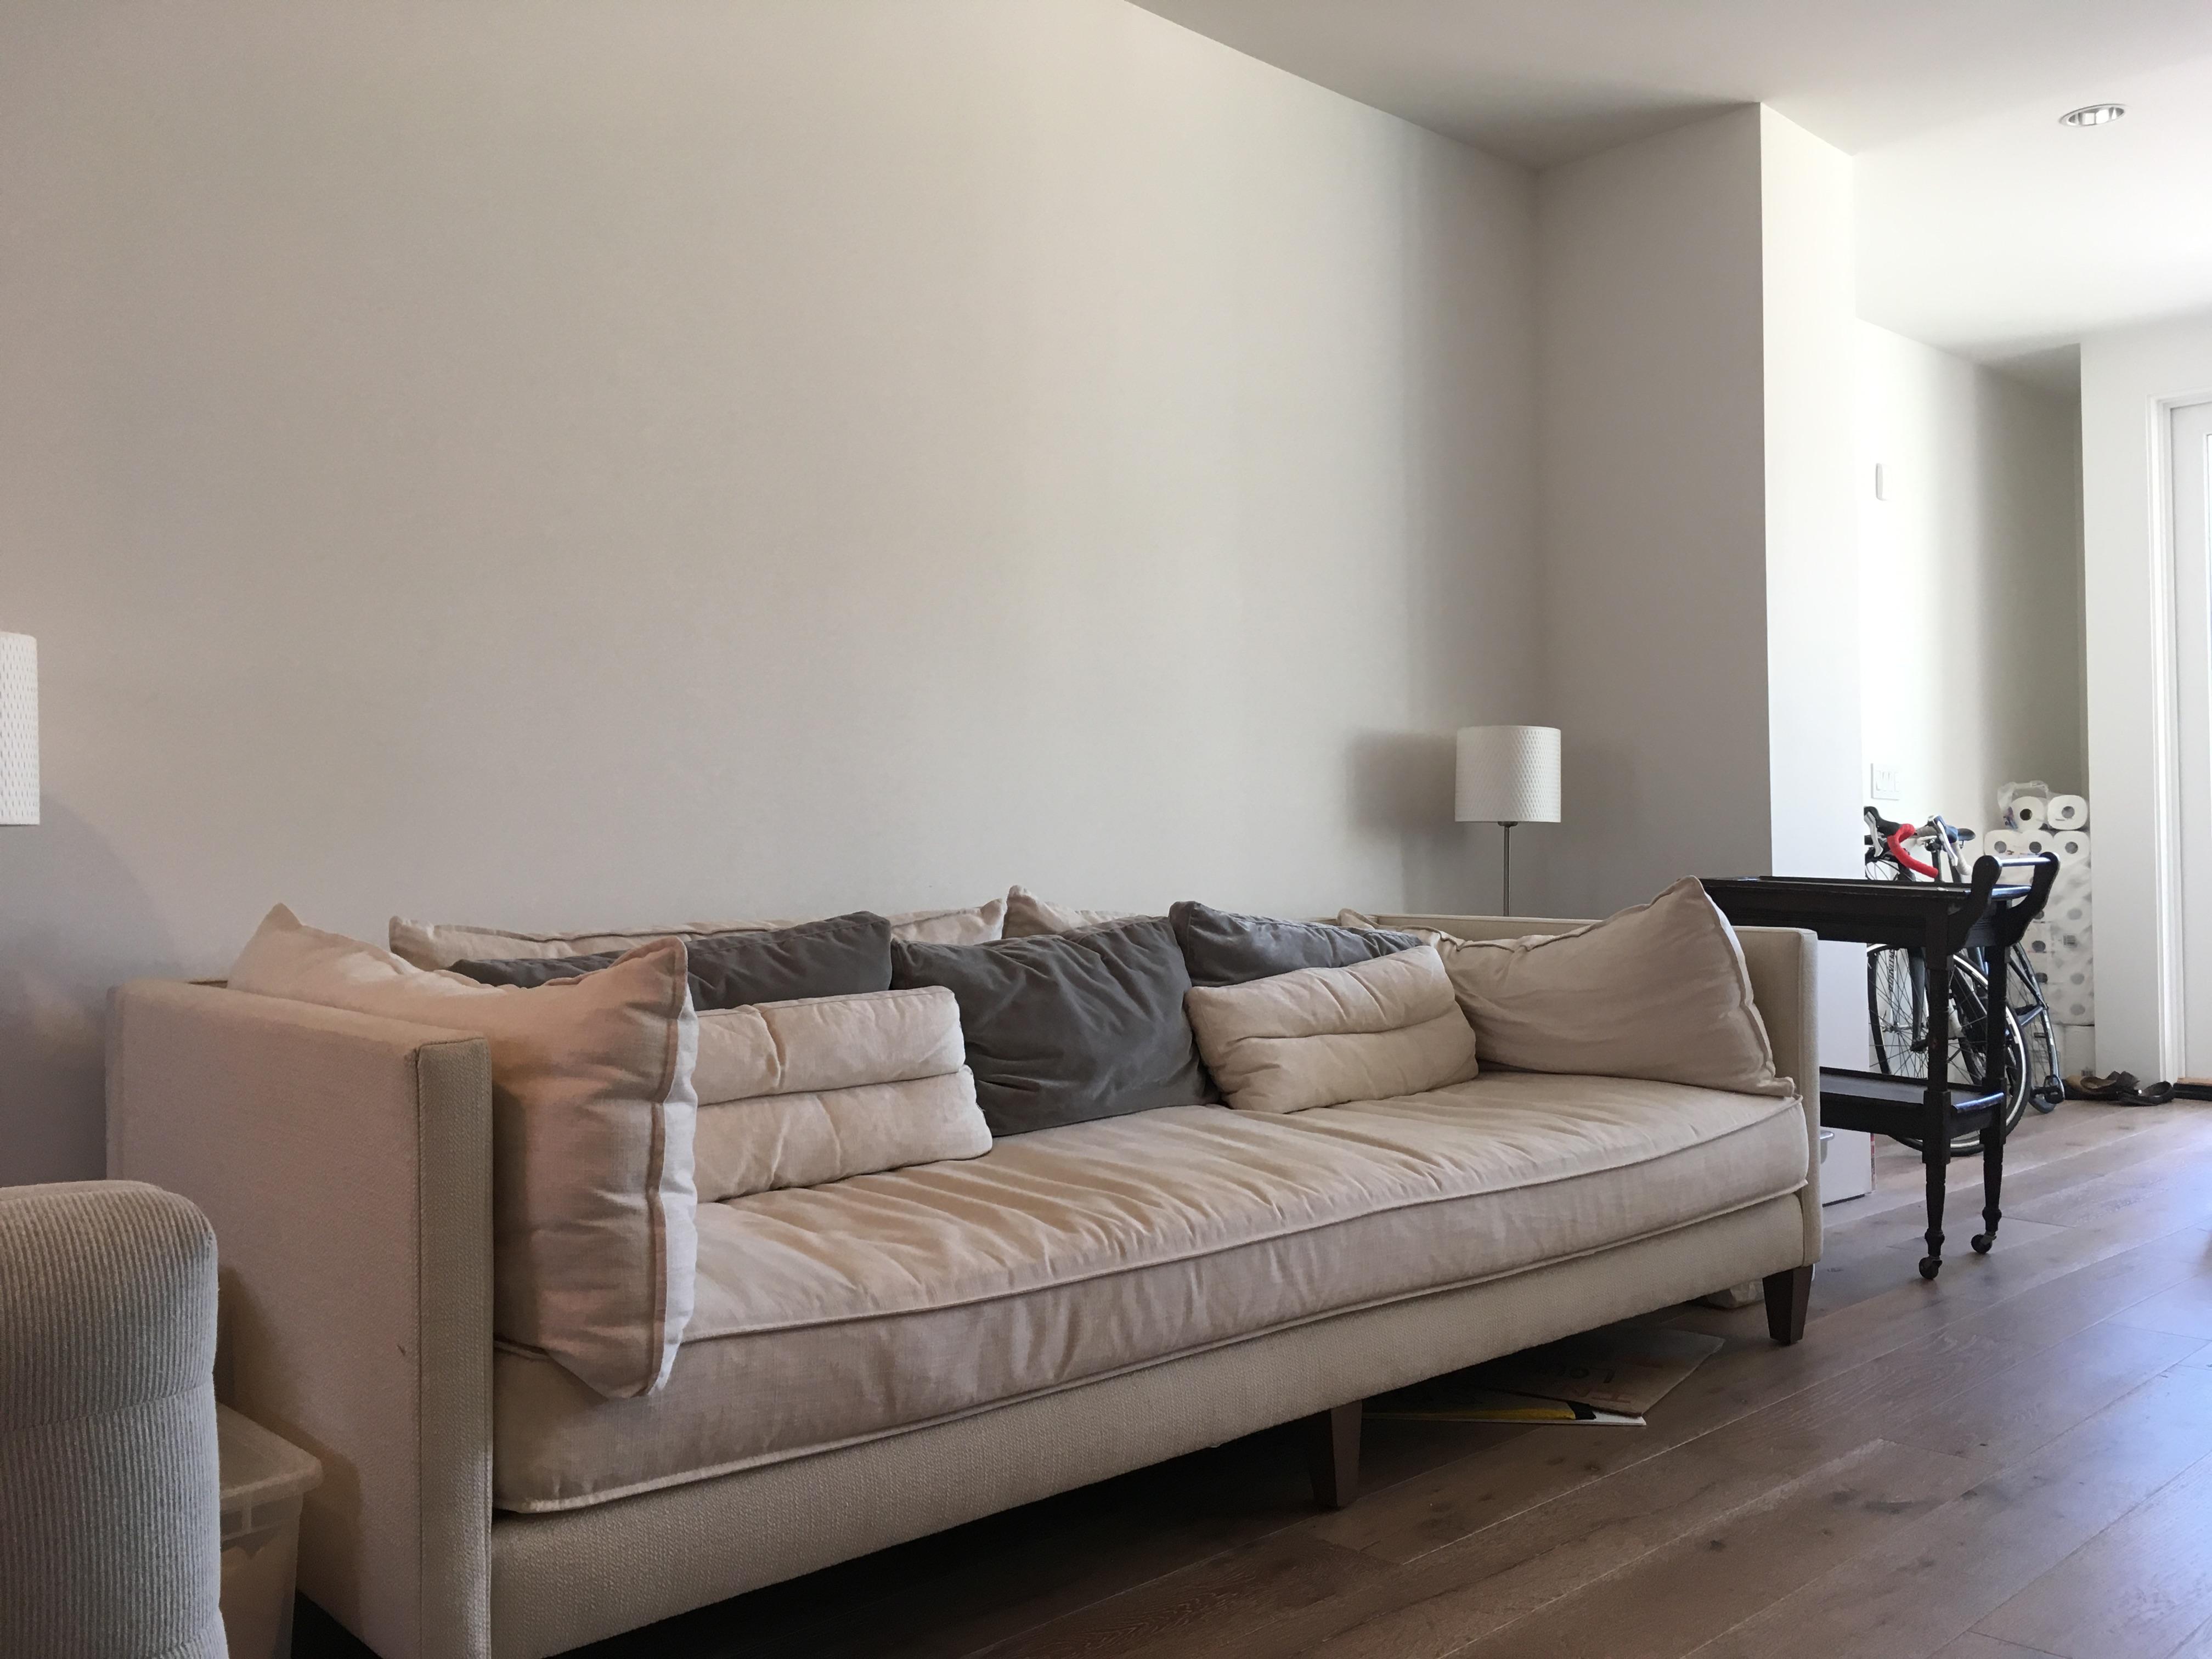 Grand 101 Asana Sofa From Crate Barrel Apartment Therapy S Bazaar